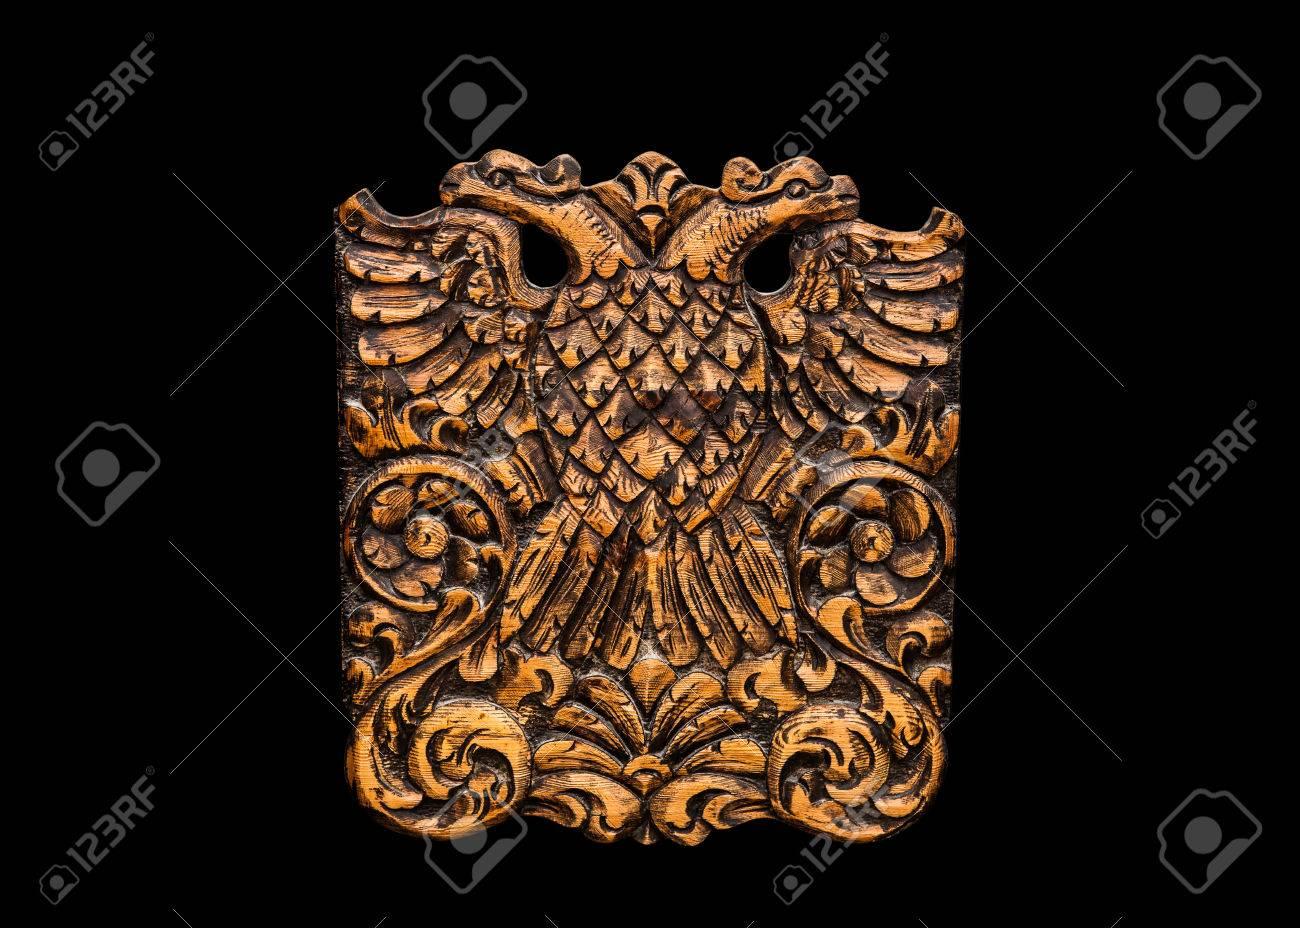 Double headed eagle common symbol in heraldry and vexillology double headed eagle common symbol in heraldry and vexillology it is most commonly associated buycottarizona Gallery